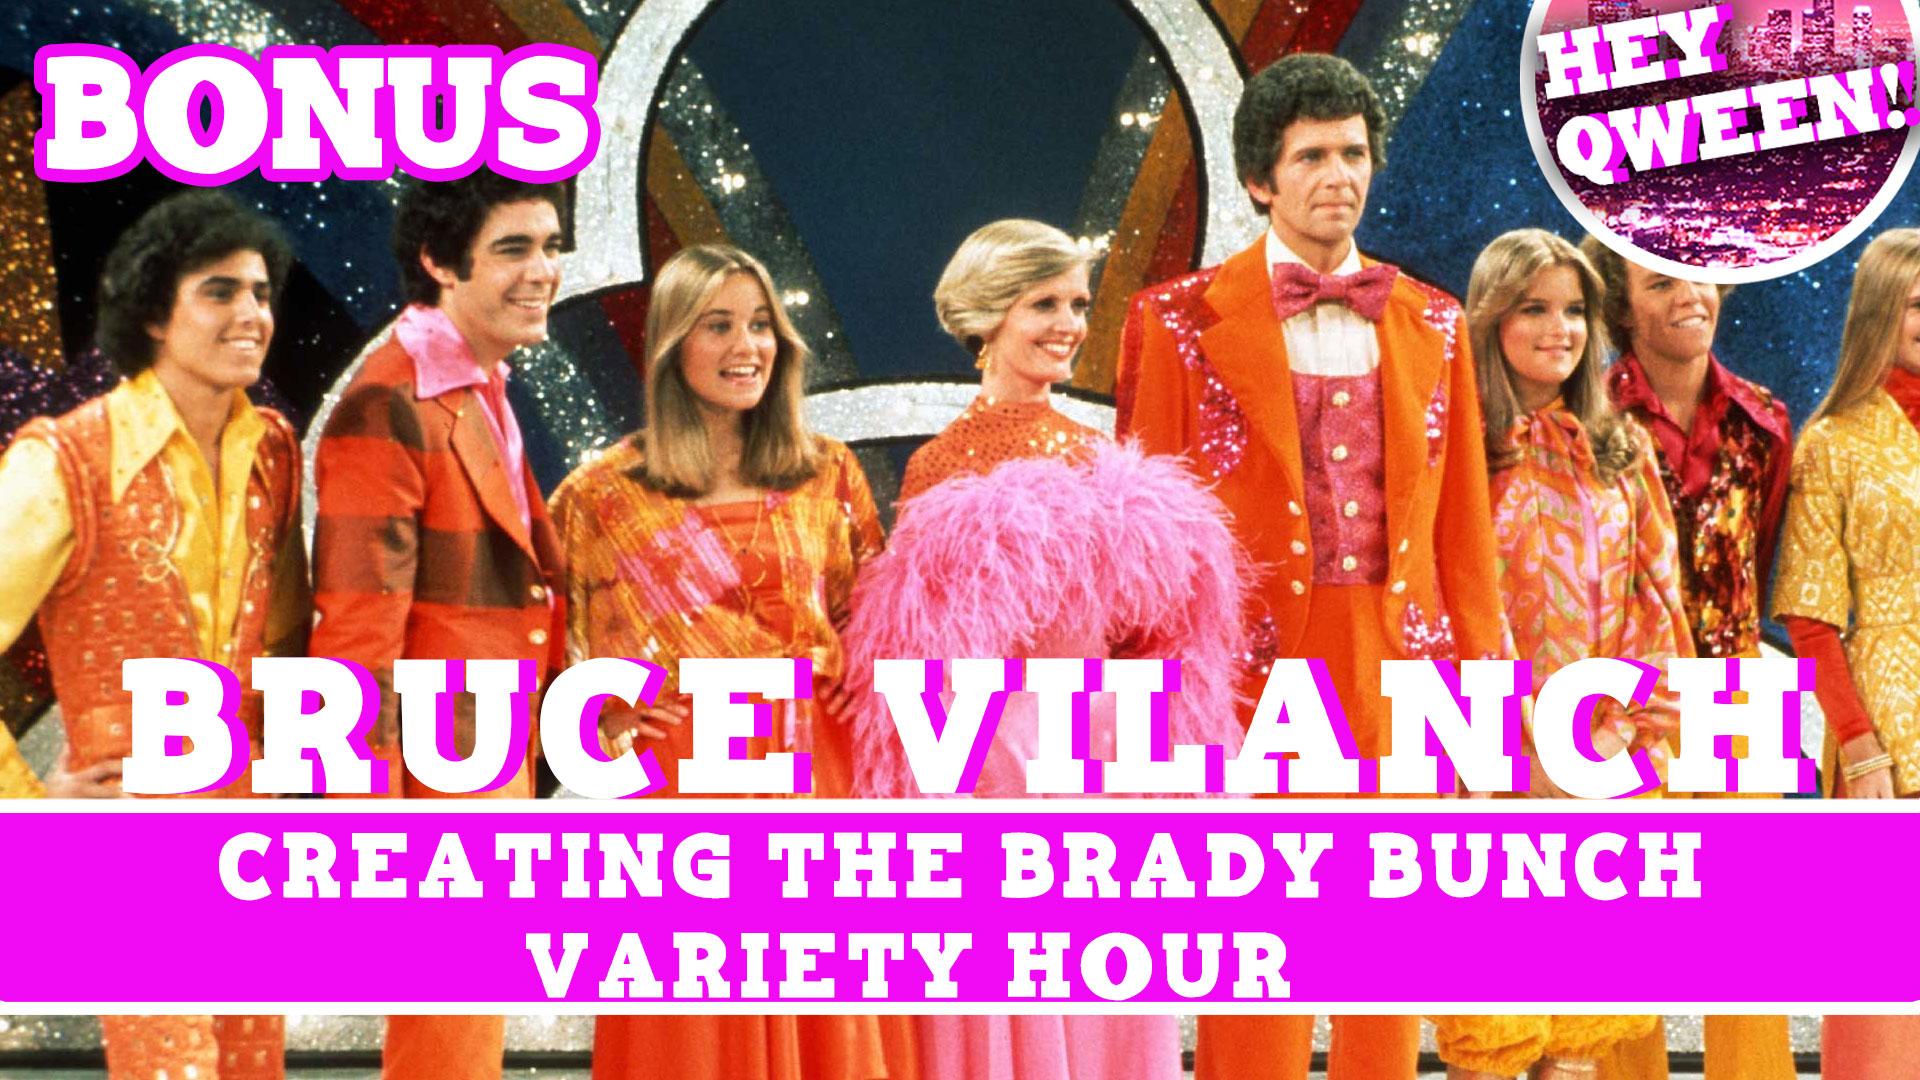 Hey Qween! BONUS: Bruce Vilanch On Creating The Brady Bunch Variety Hour